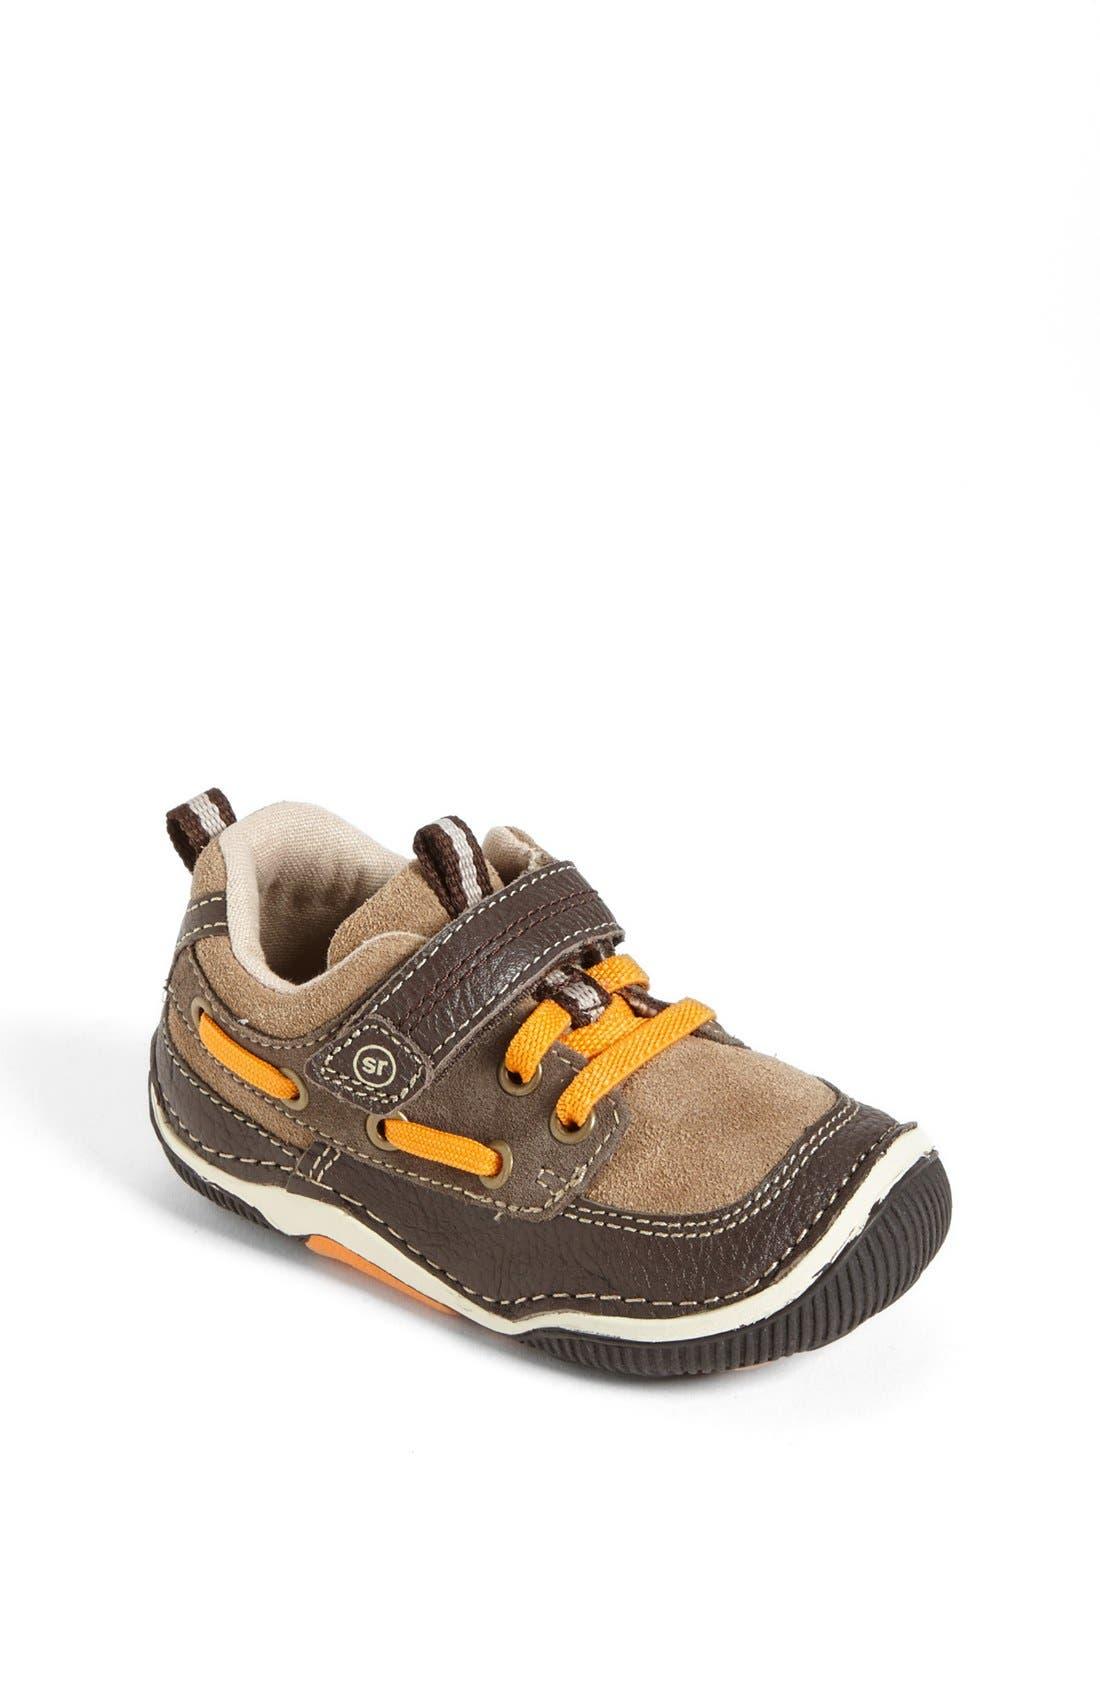 Alternate Image 1 Selected - Stride Rite 'Mosby' Sneaker (Baby, Walker & Toddler)